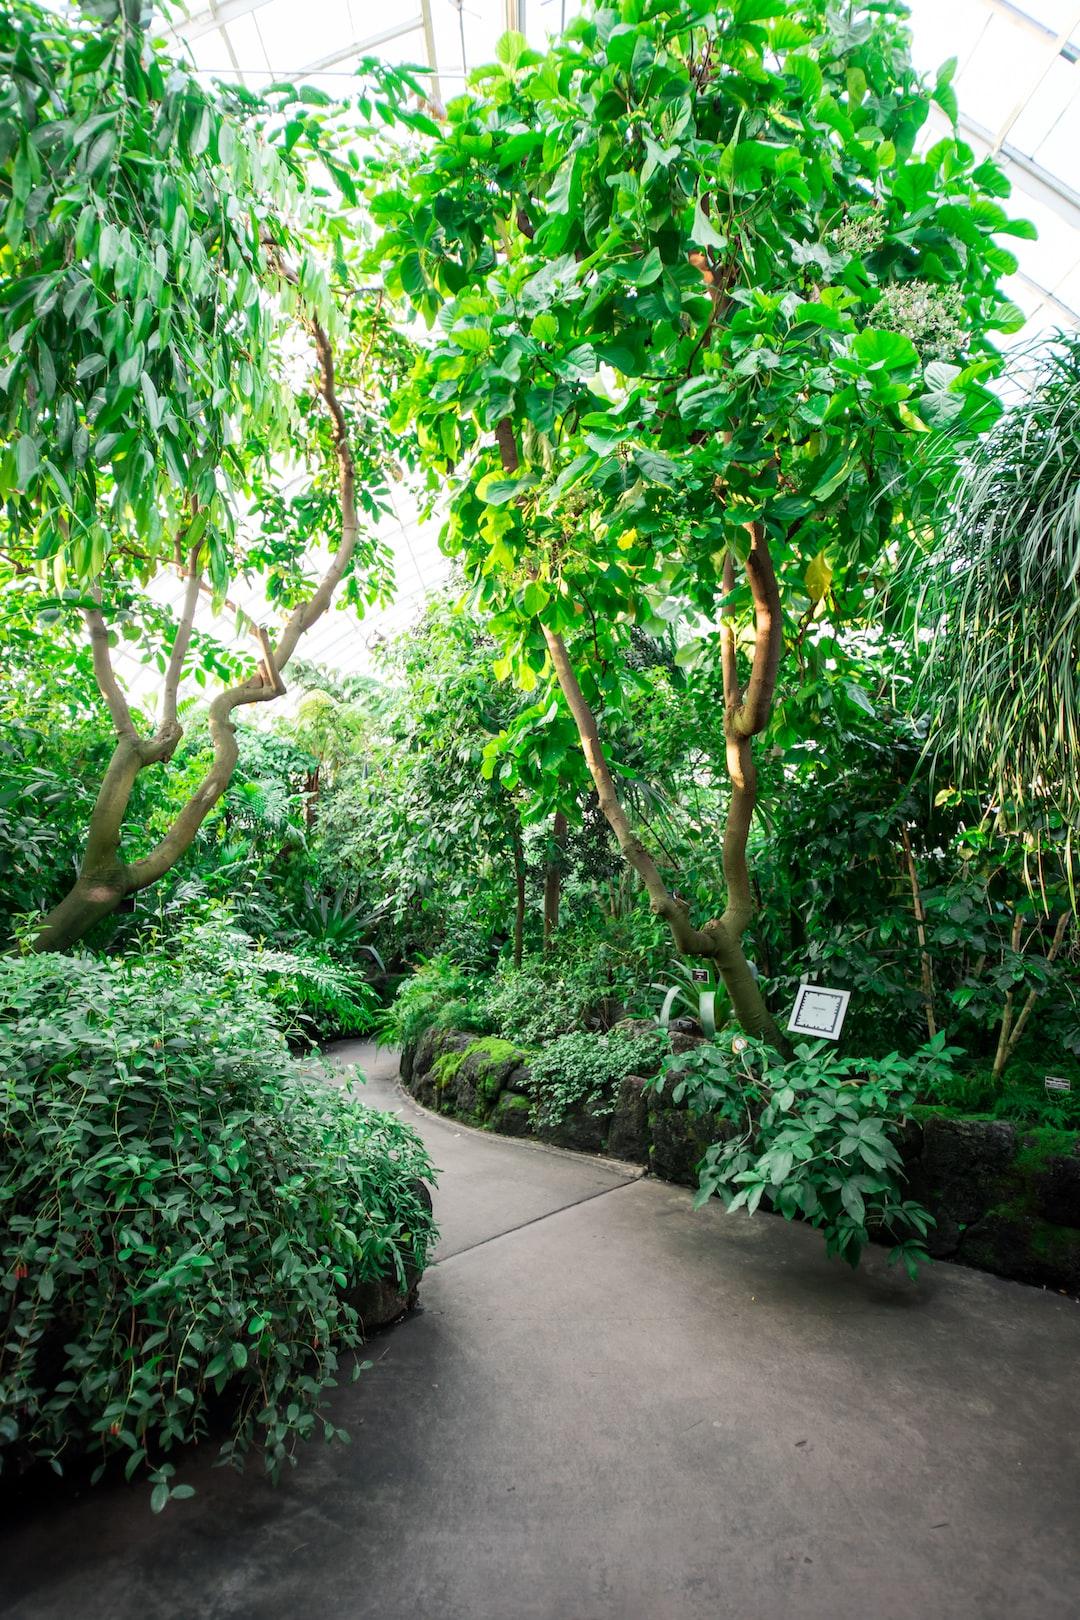 Through the jungle.